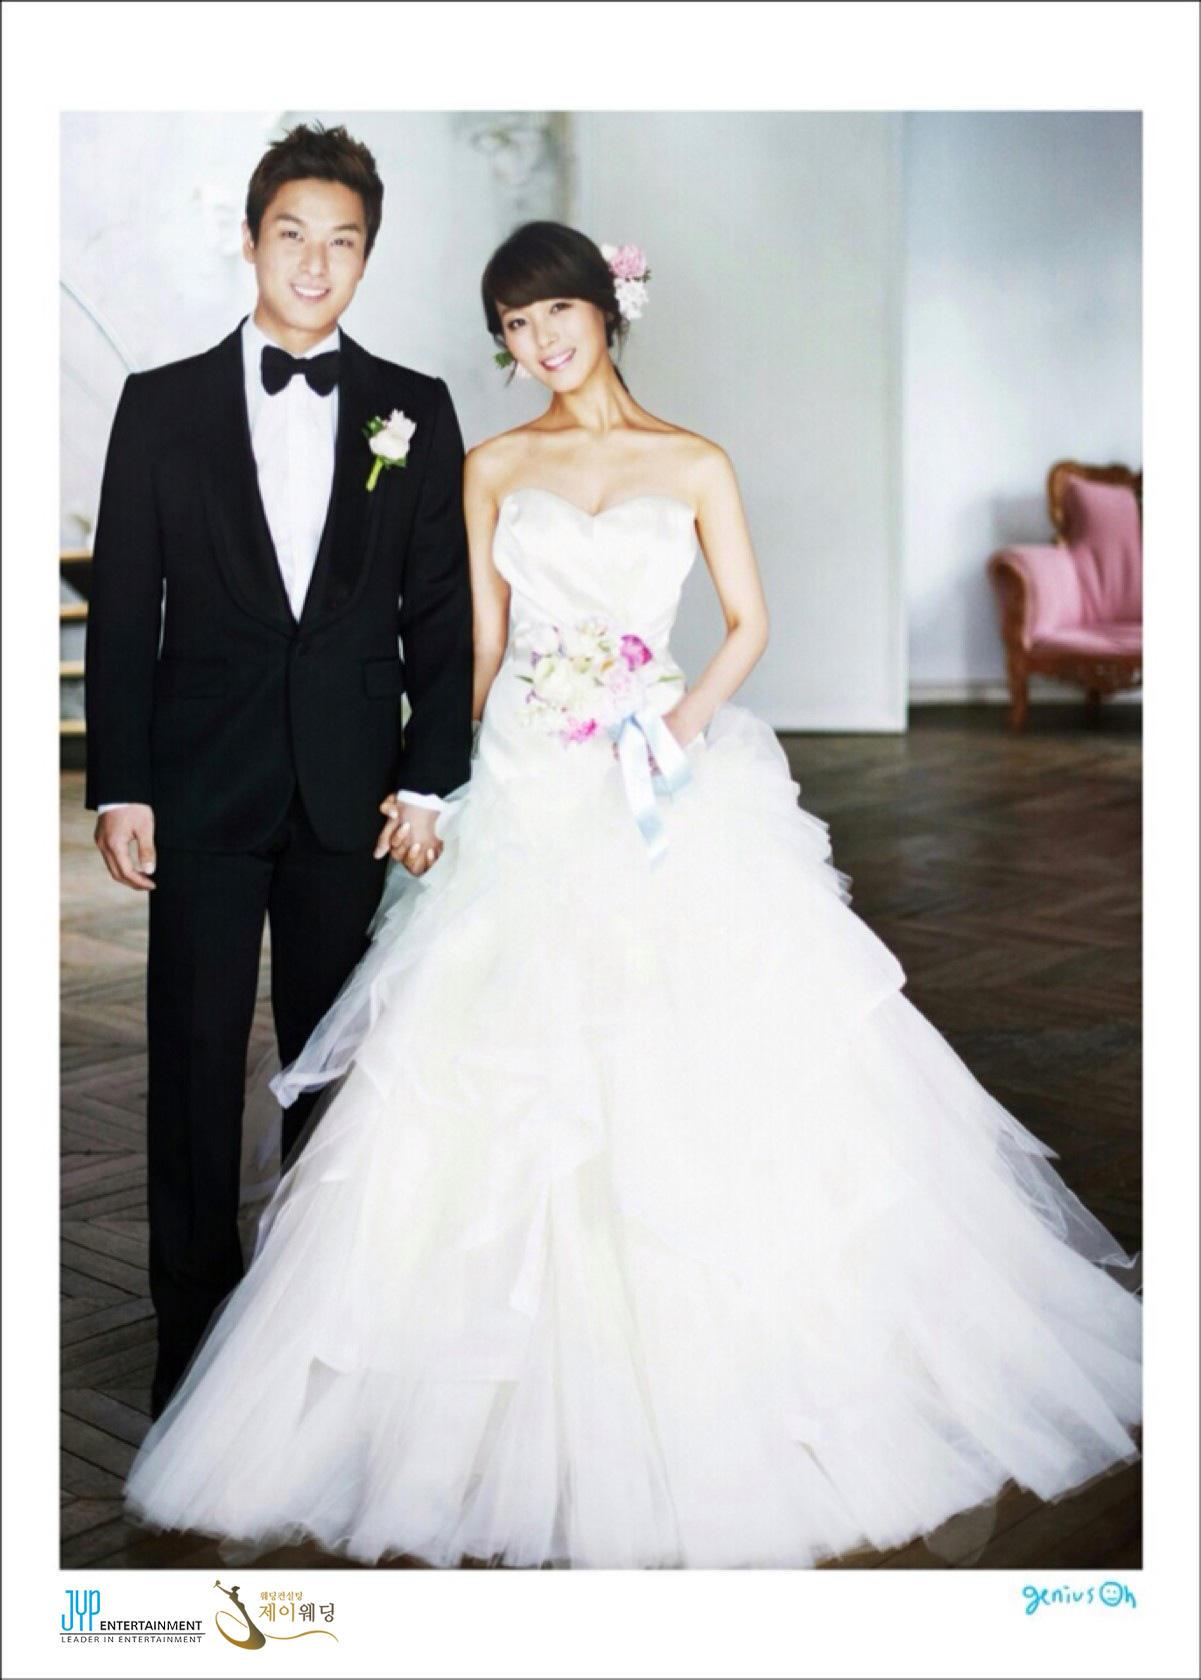 @jypnation: ↓ロミ→ヘヤ↑ᄆᄌ↓ハᄂ ↓トᅠ↓リネ↓ヨム↓ンリ ↓ロᄄ→ヤᄅ↓ツᆲ↓ᄃト↓ント ↑ᄈᄉ↑ᄚワ■ユᄅ→ヒネ→ヒᄂ¬ルᆬ ↓ᅠユ→ᄃミ ↓ユト→ᆭト→ヒᄂ↓レᄡ ↑ᄋᄌ→ナタ¬ルᆬ Wonder Girls Sun¬タルs Wedding Photos hv been revealed¬ルᆬ Isn¬タルt She WonderFul¬ルᆬ http://t.co/YCwj3BPX